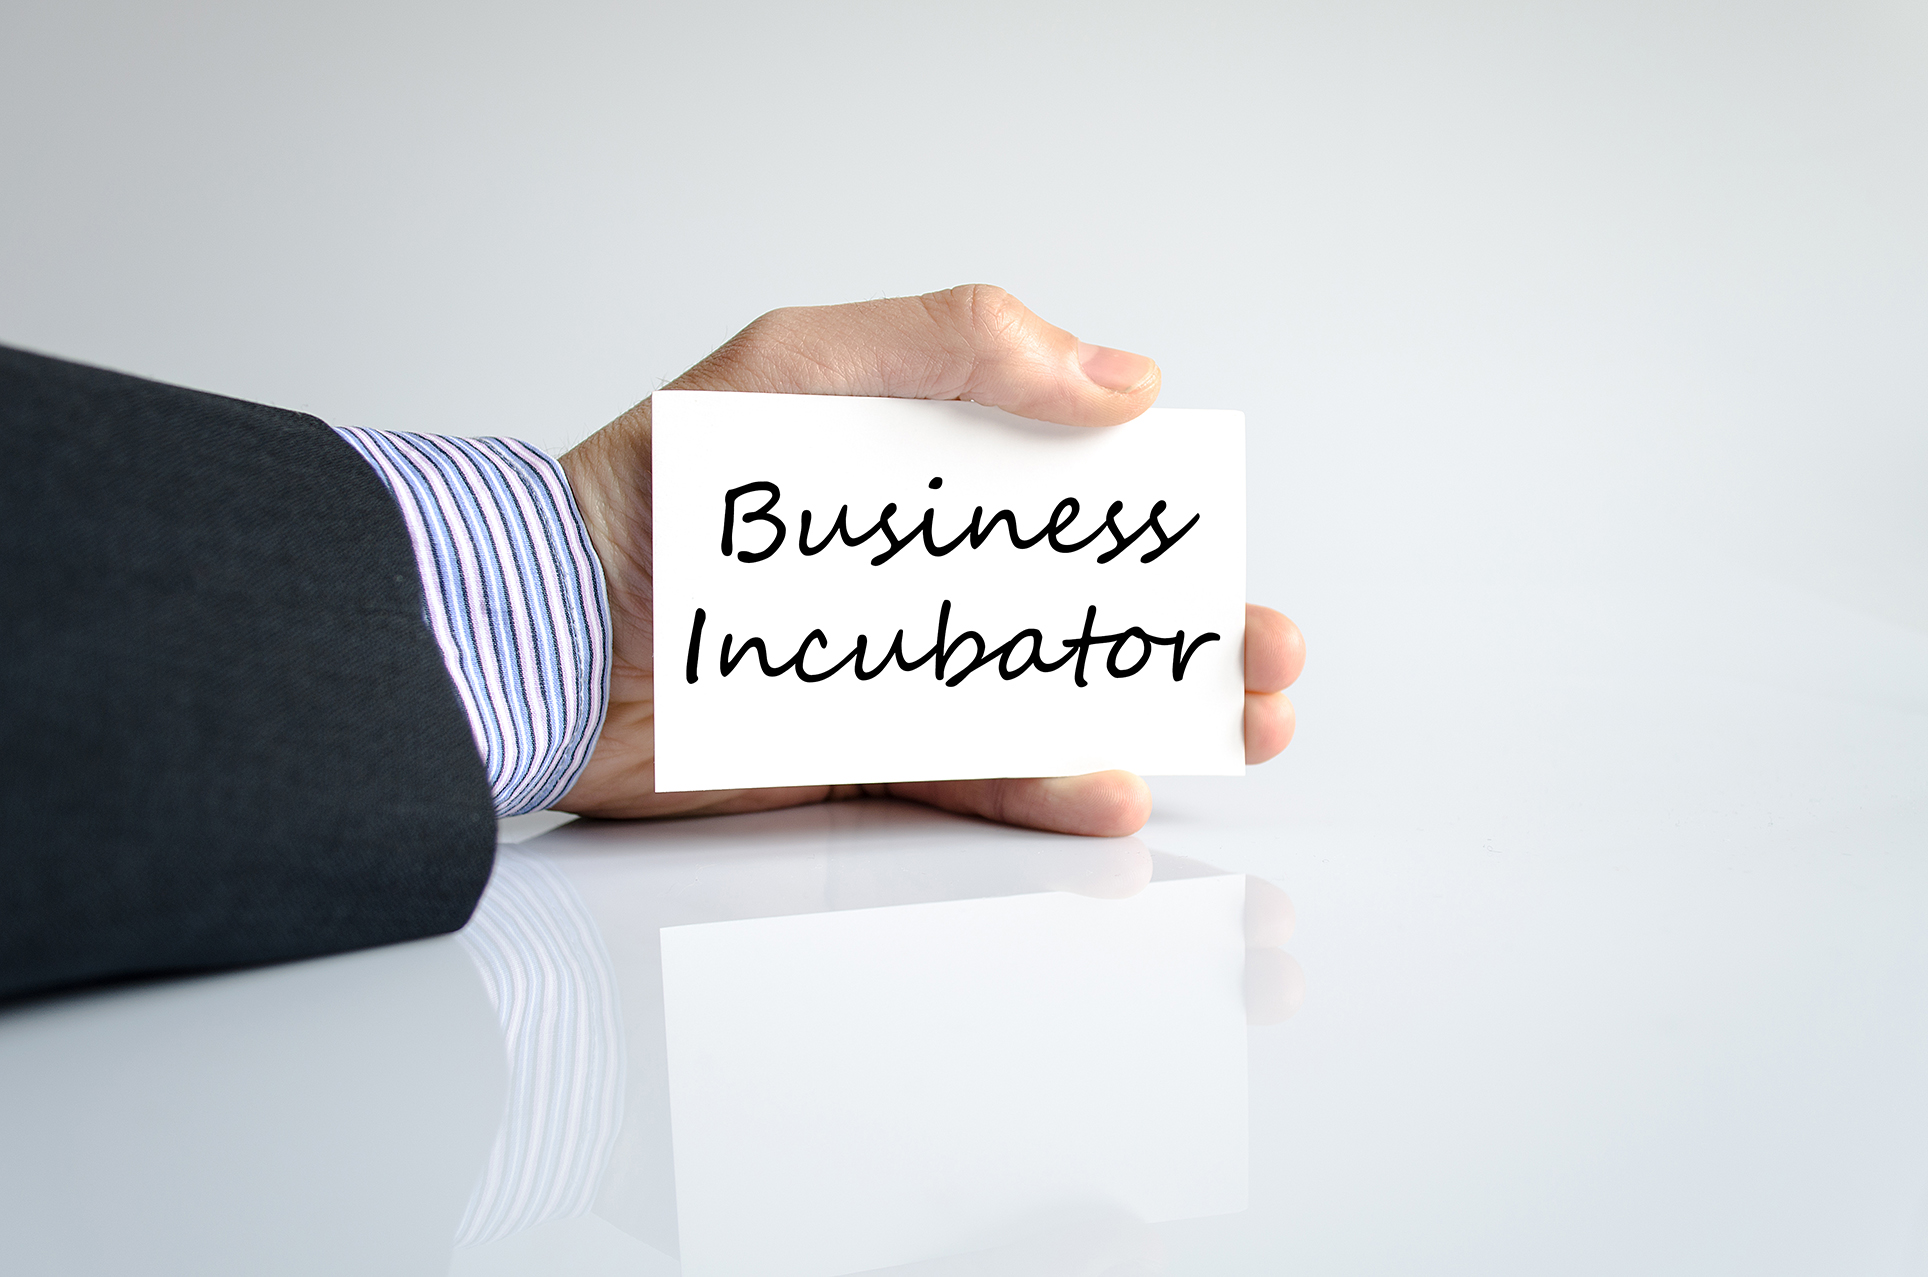 incubator definition